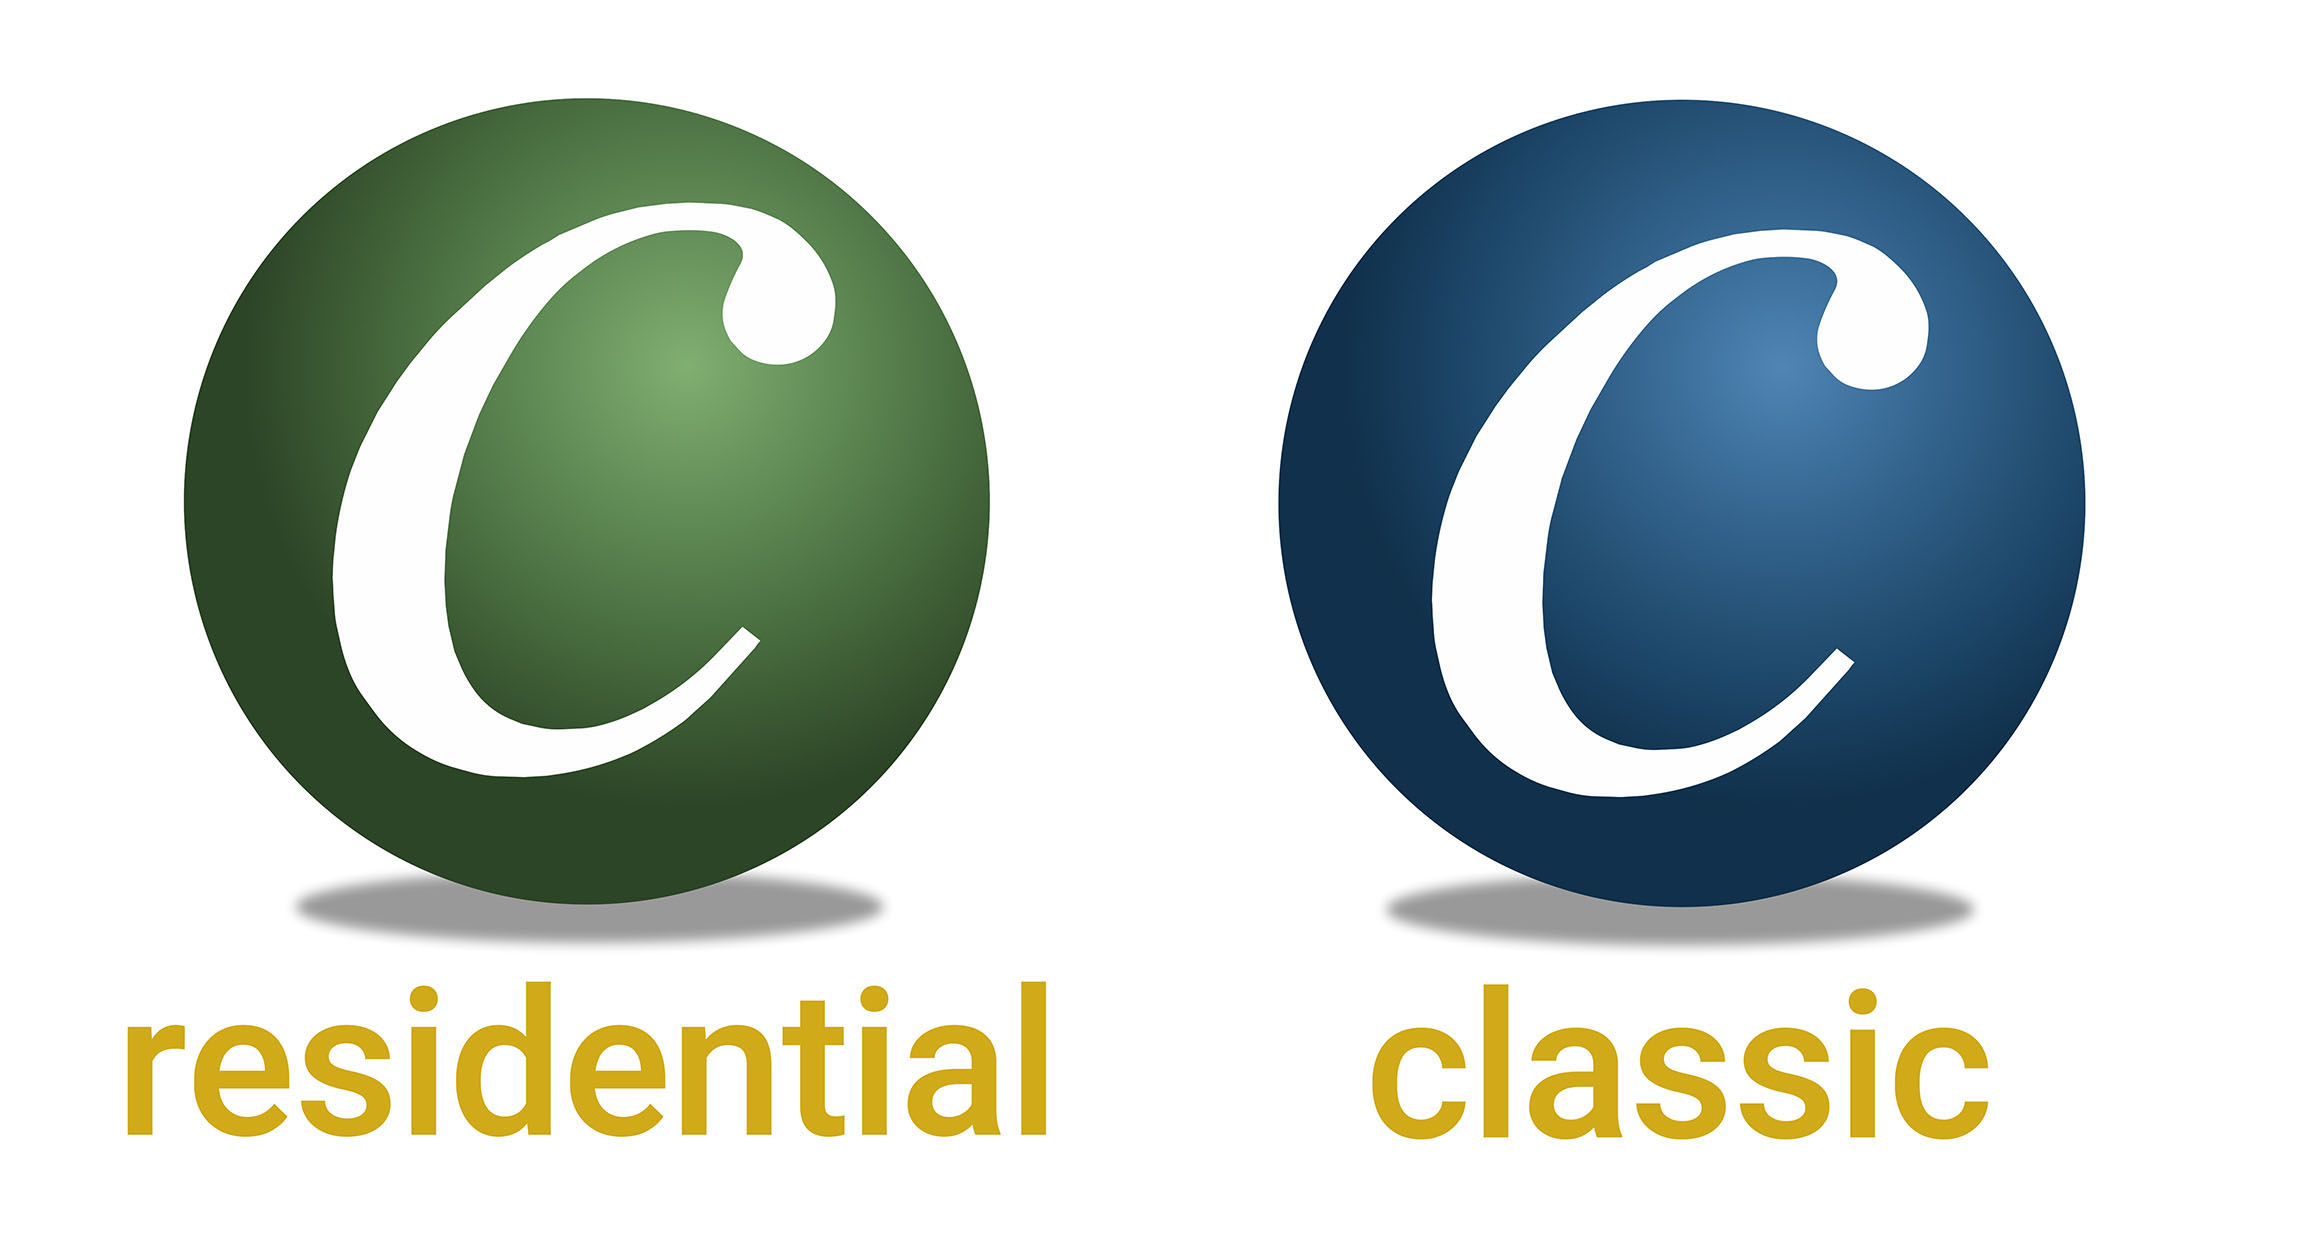 C residential